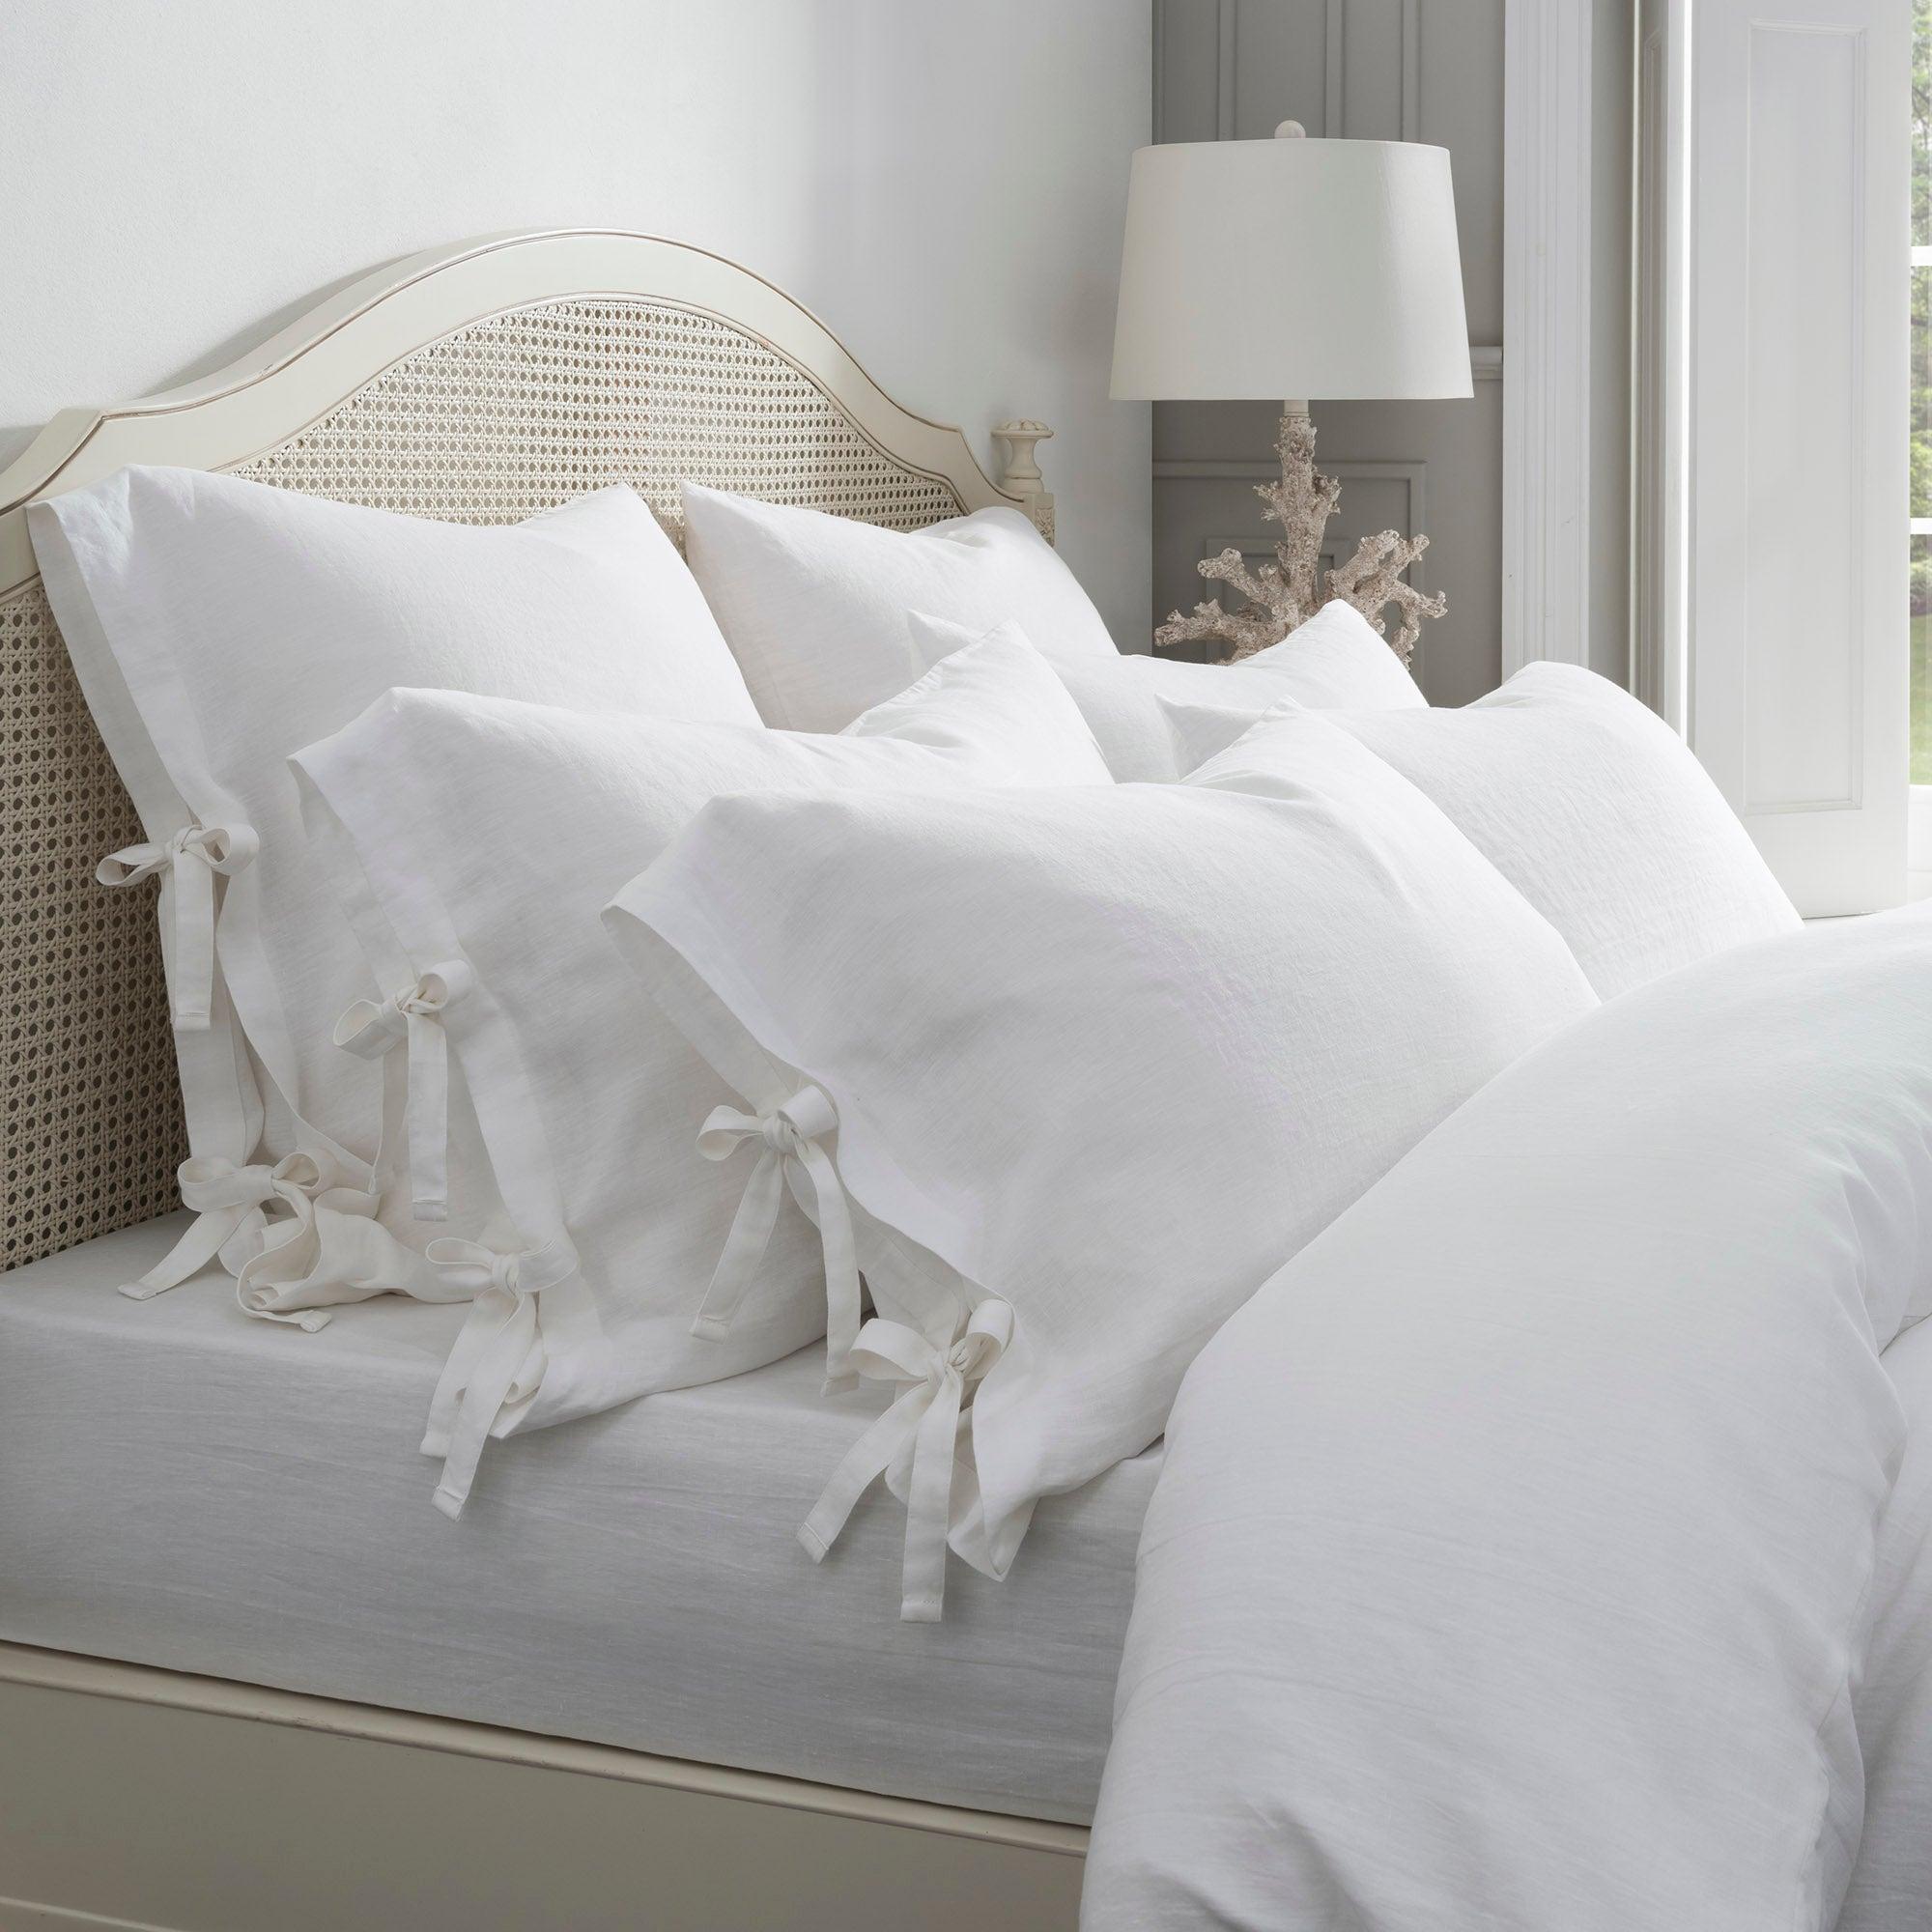 Image of Dorma 100% Linen White Cuffed Pillowcase White